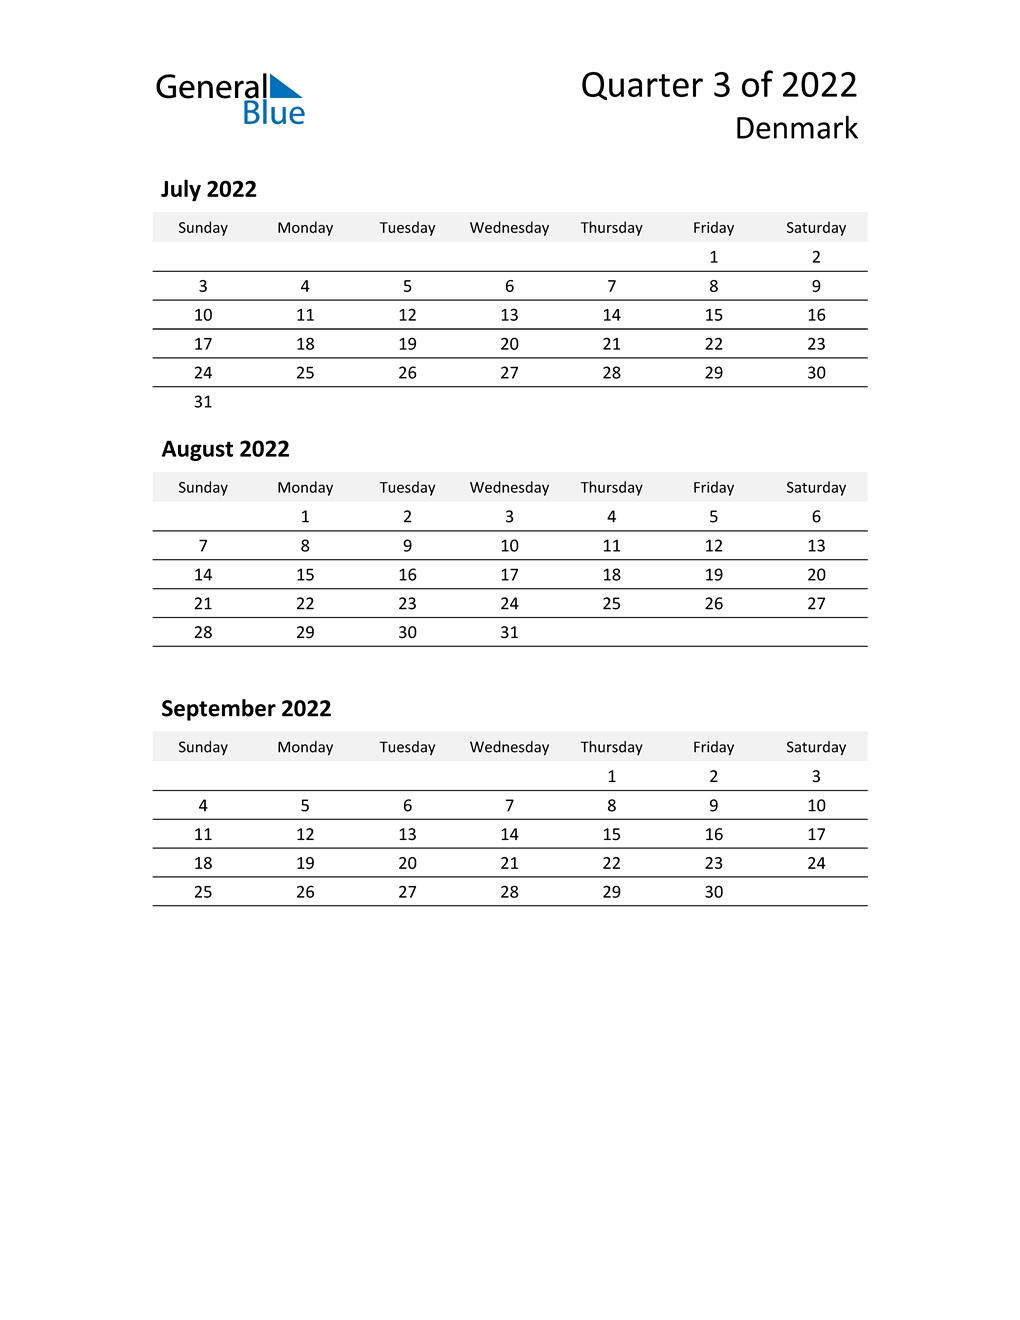 2022 Three-Month Calendar for Denmark